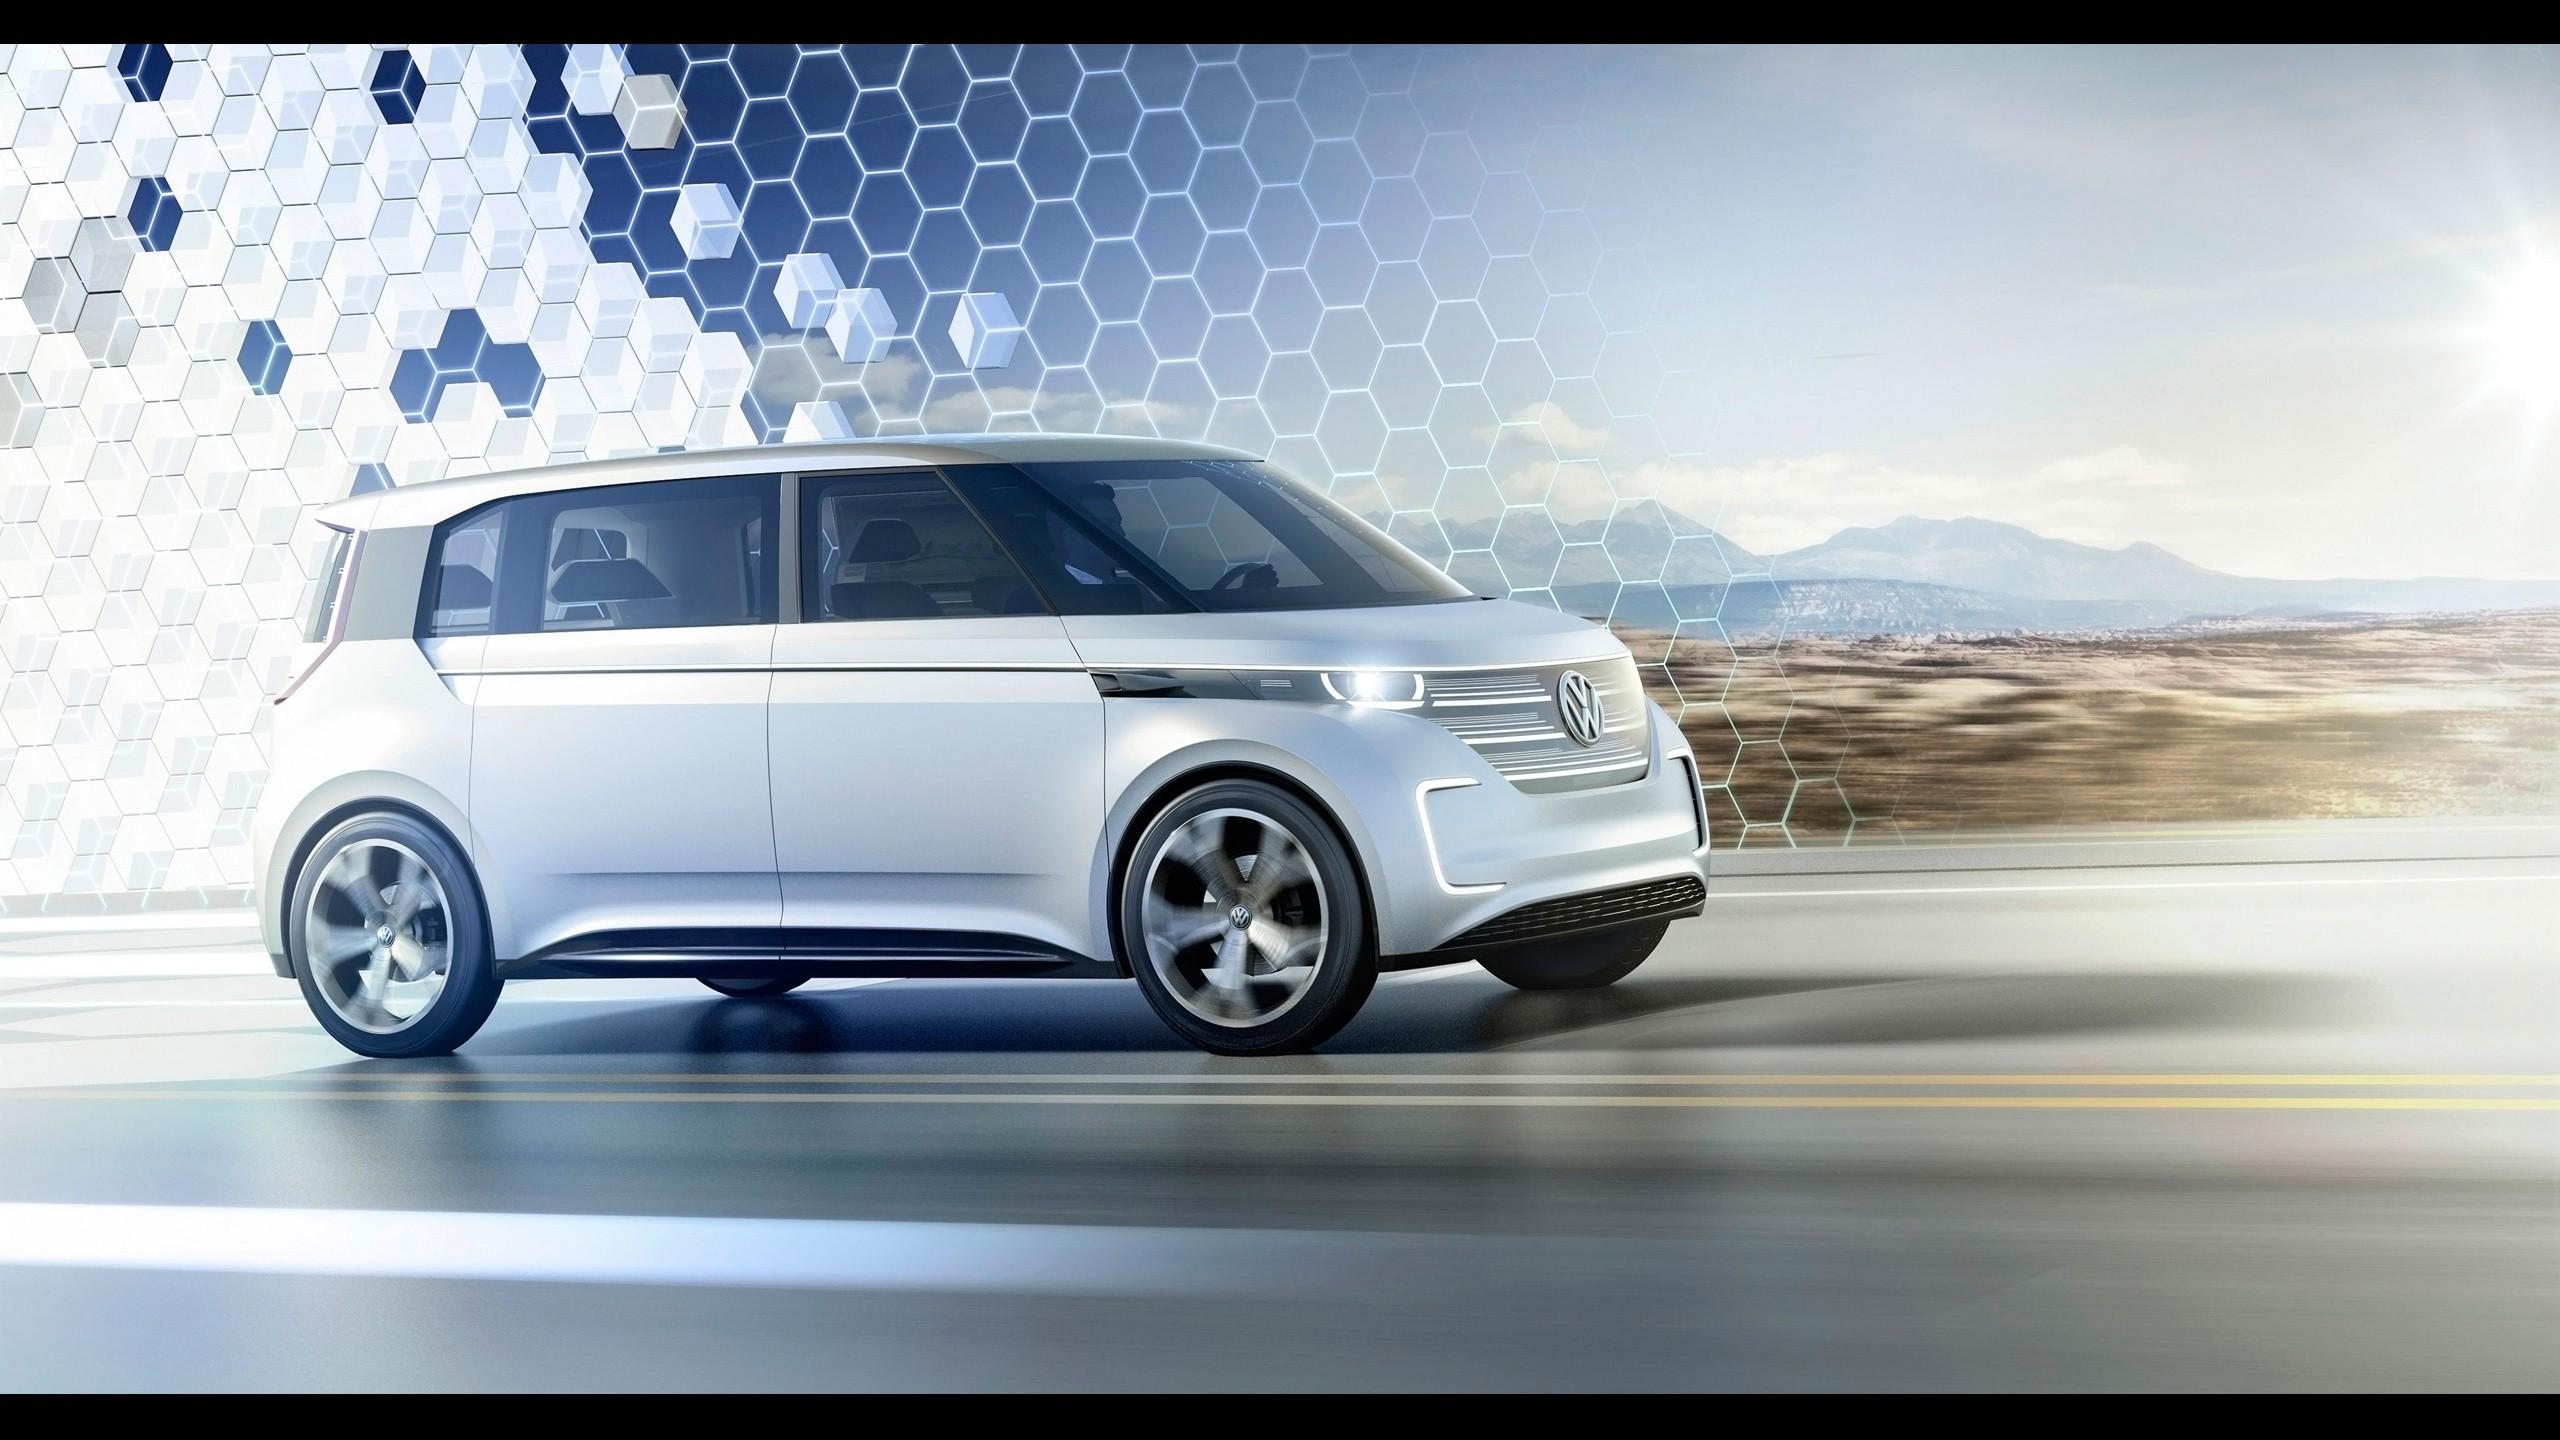 Beetle Car Hd Wallpapers 2016 Volkswagen Budd E Concept Wallpaper Hd Car